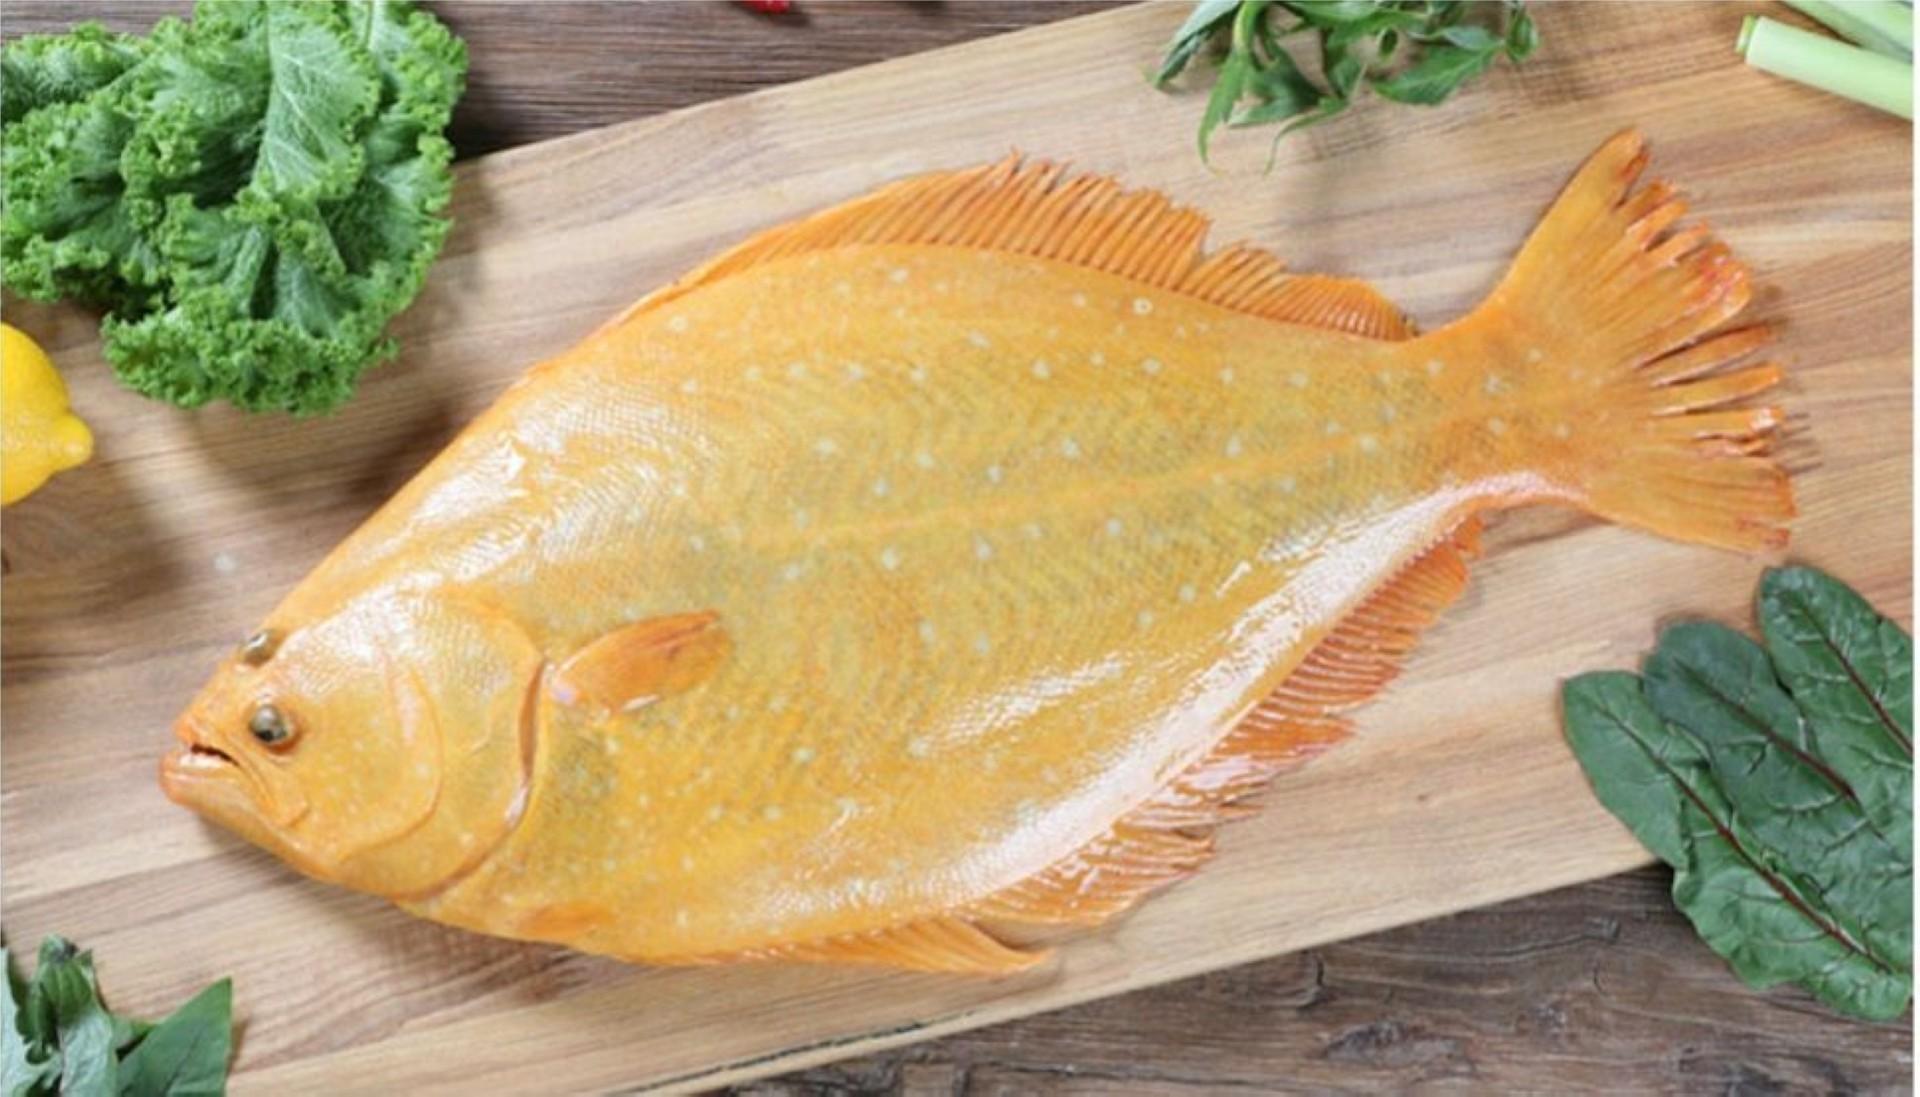 The flounder has a light and simple taste.